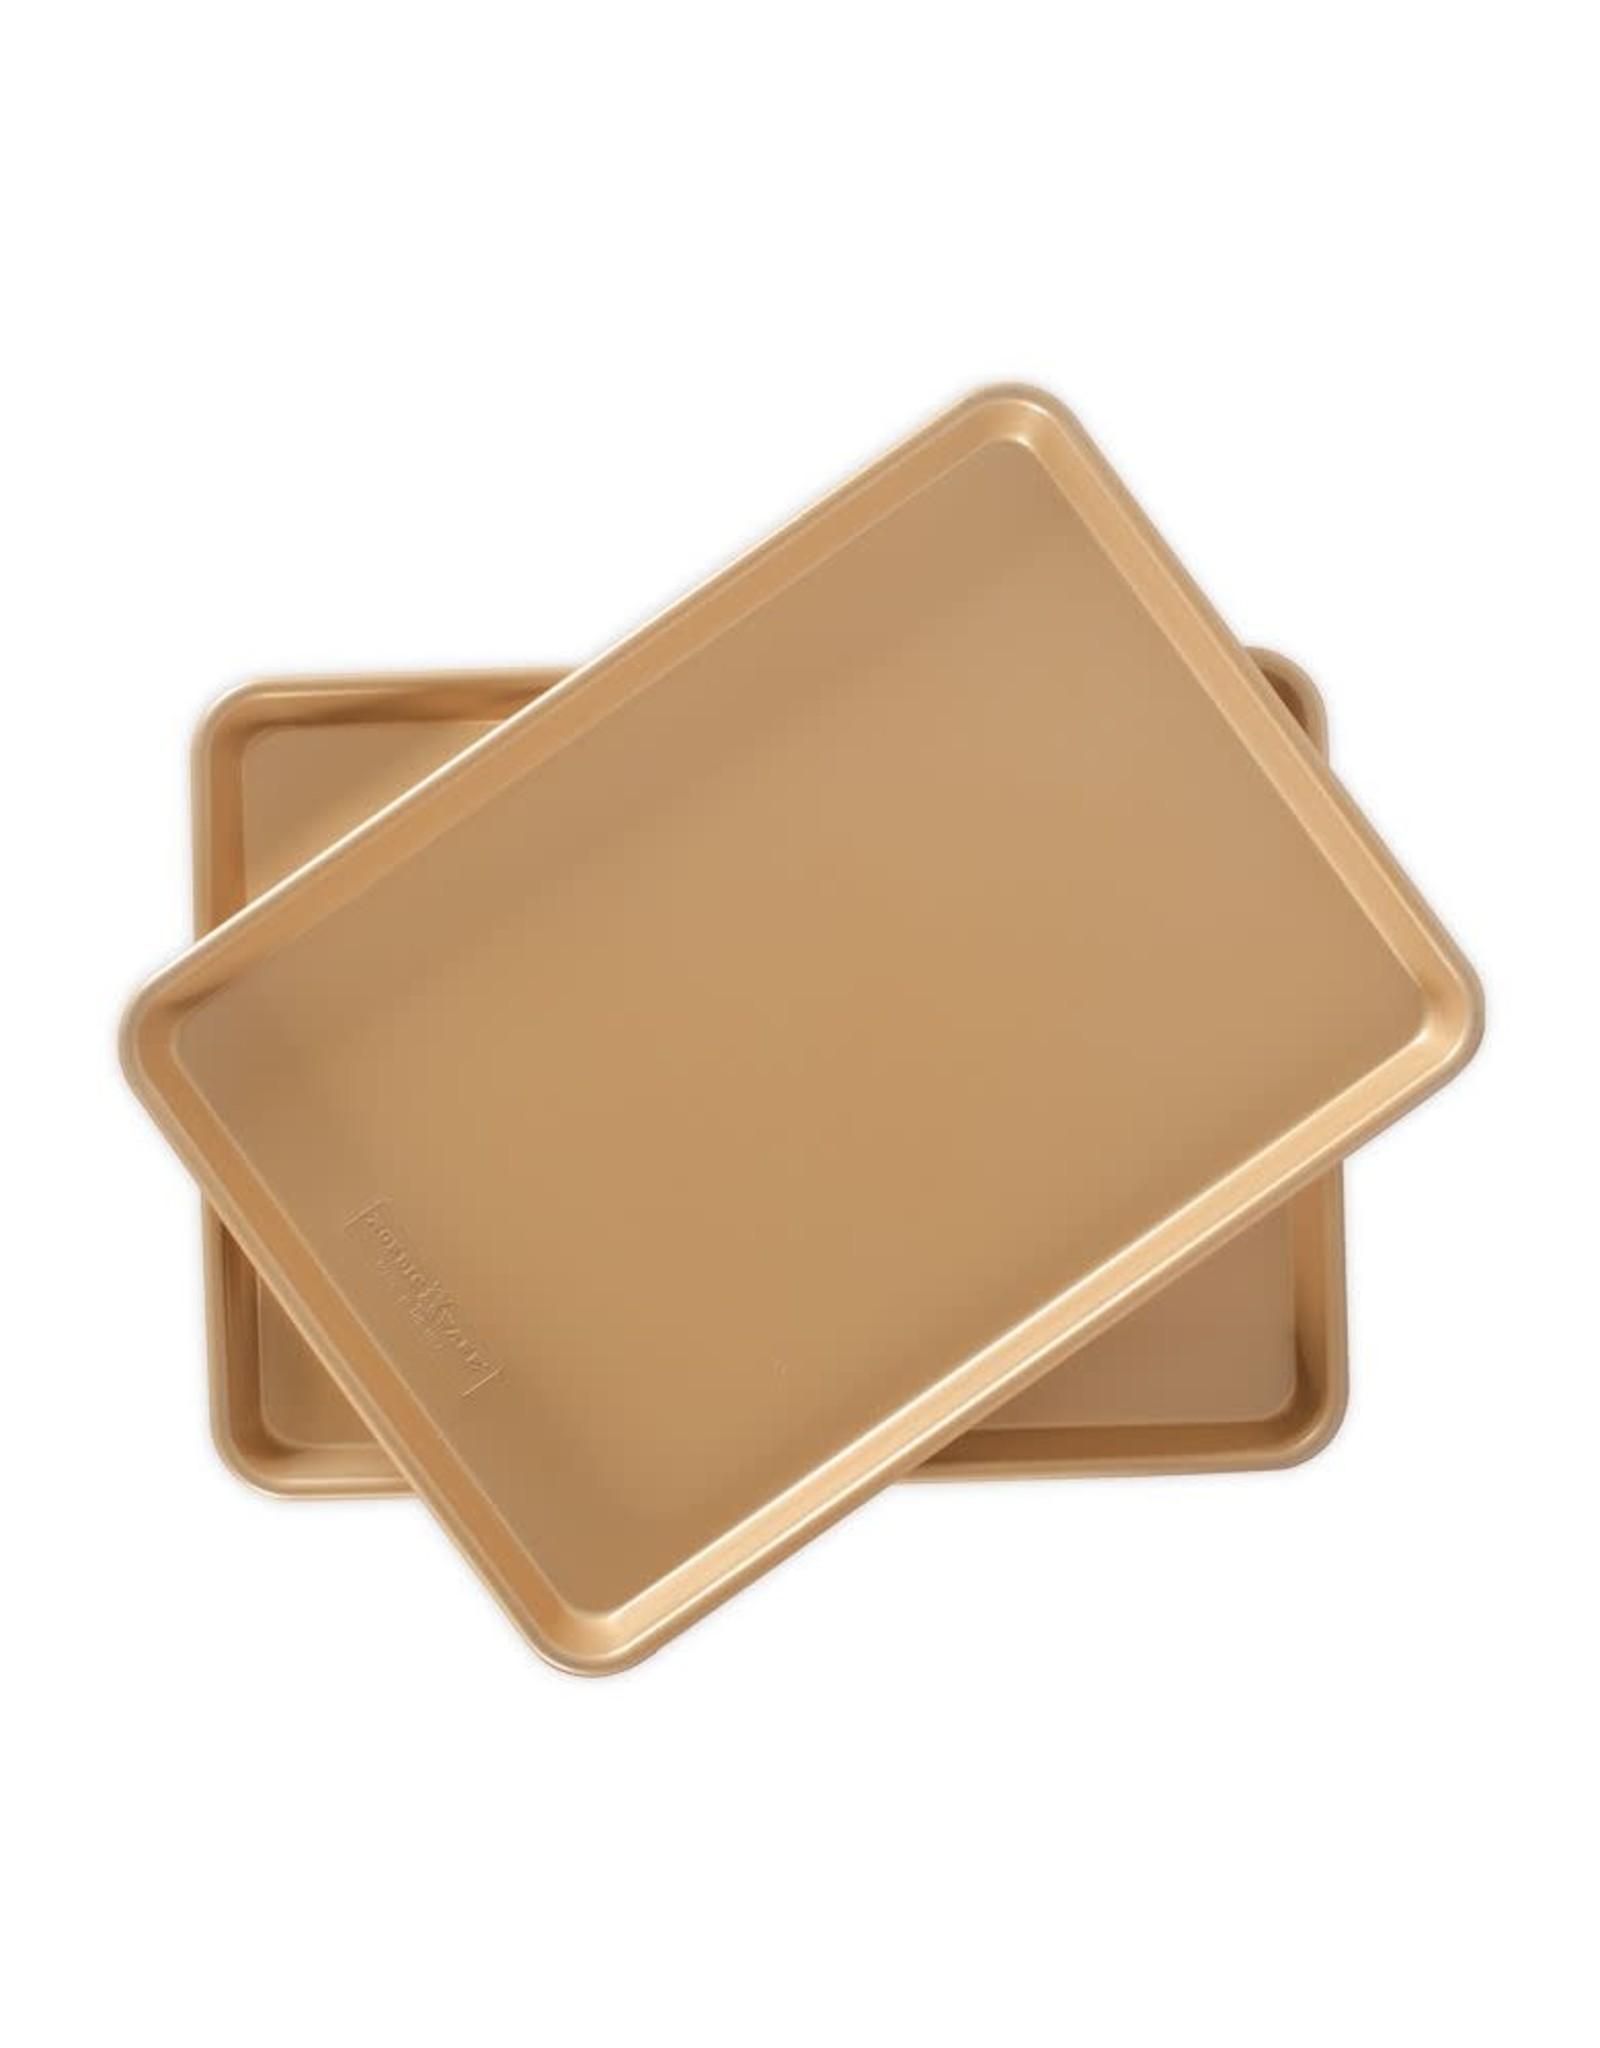 Nordicware NORDIC  Non-Stick Half Baking Sheet 2pack